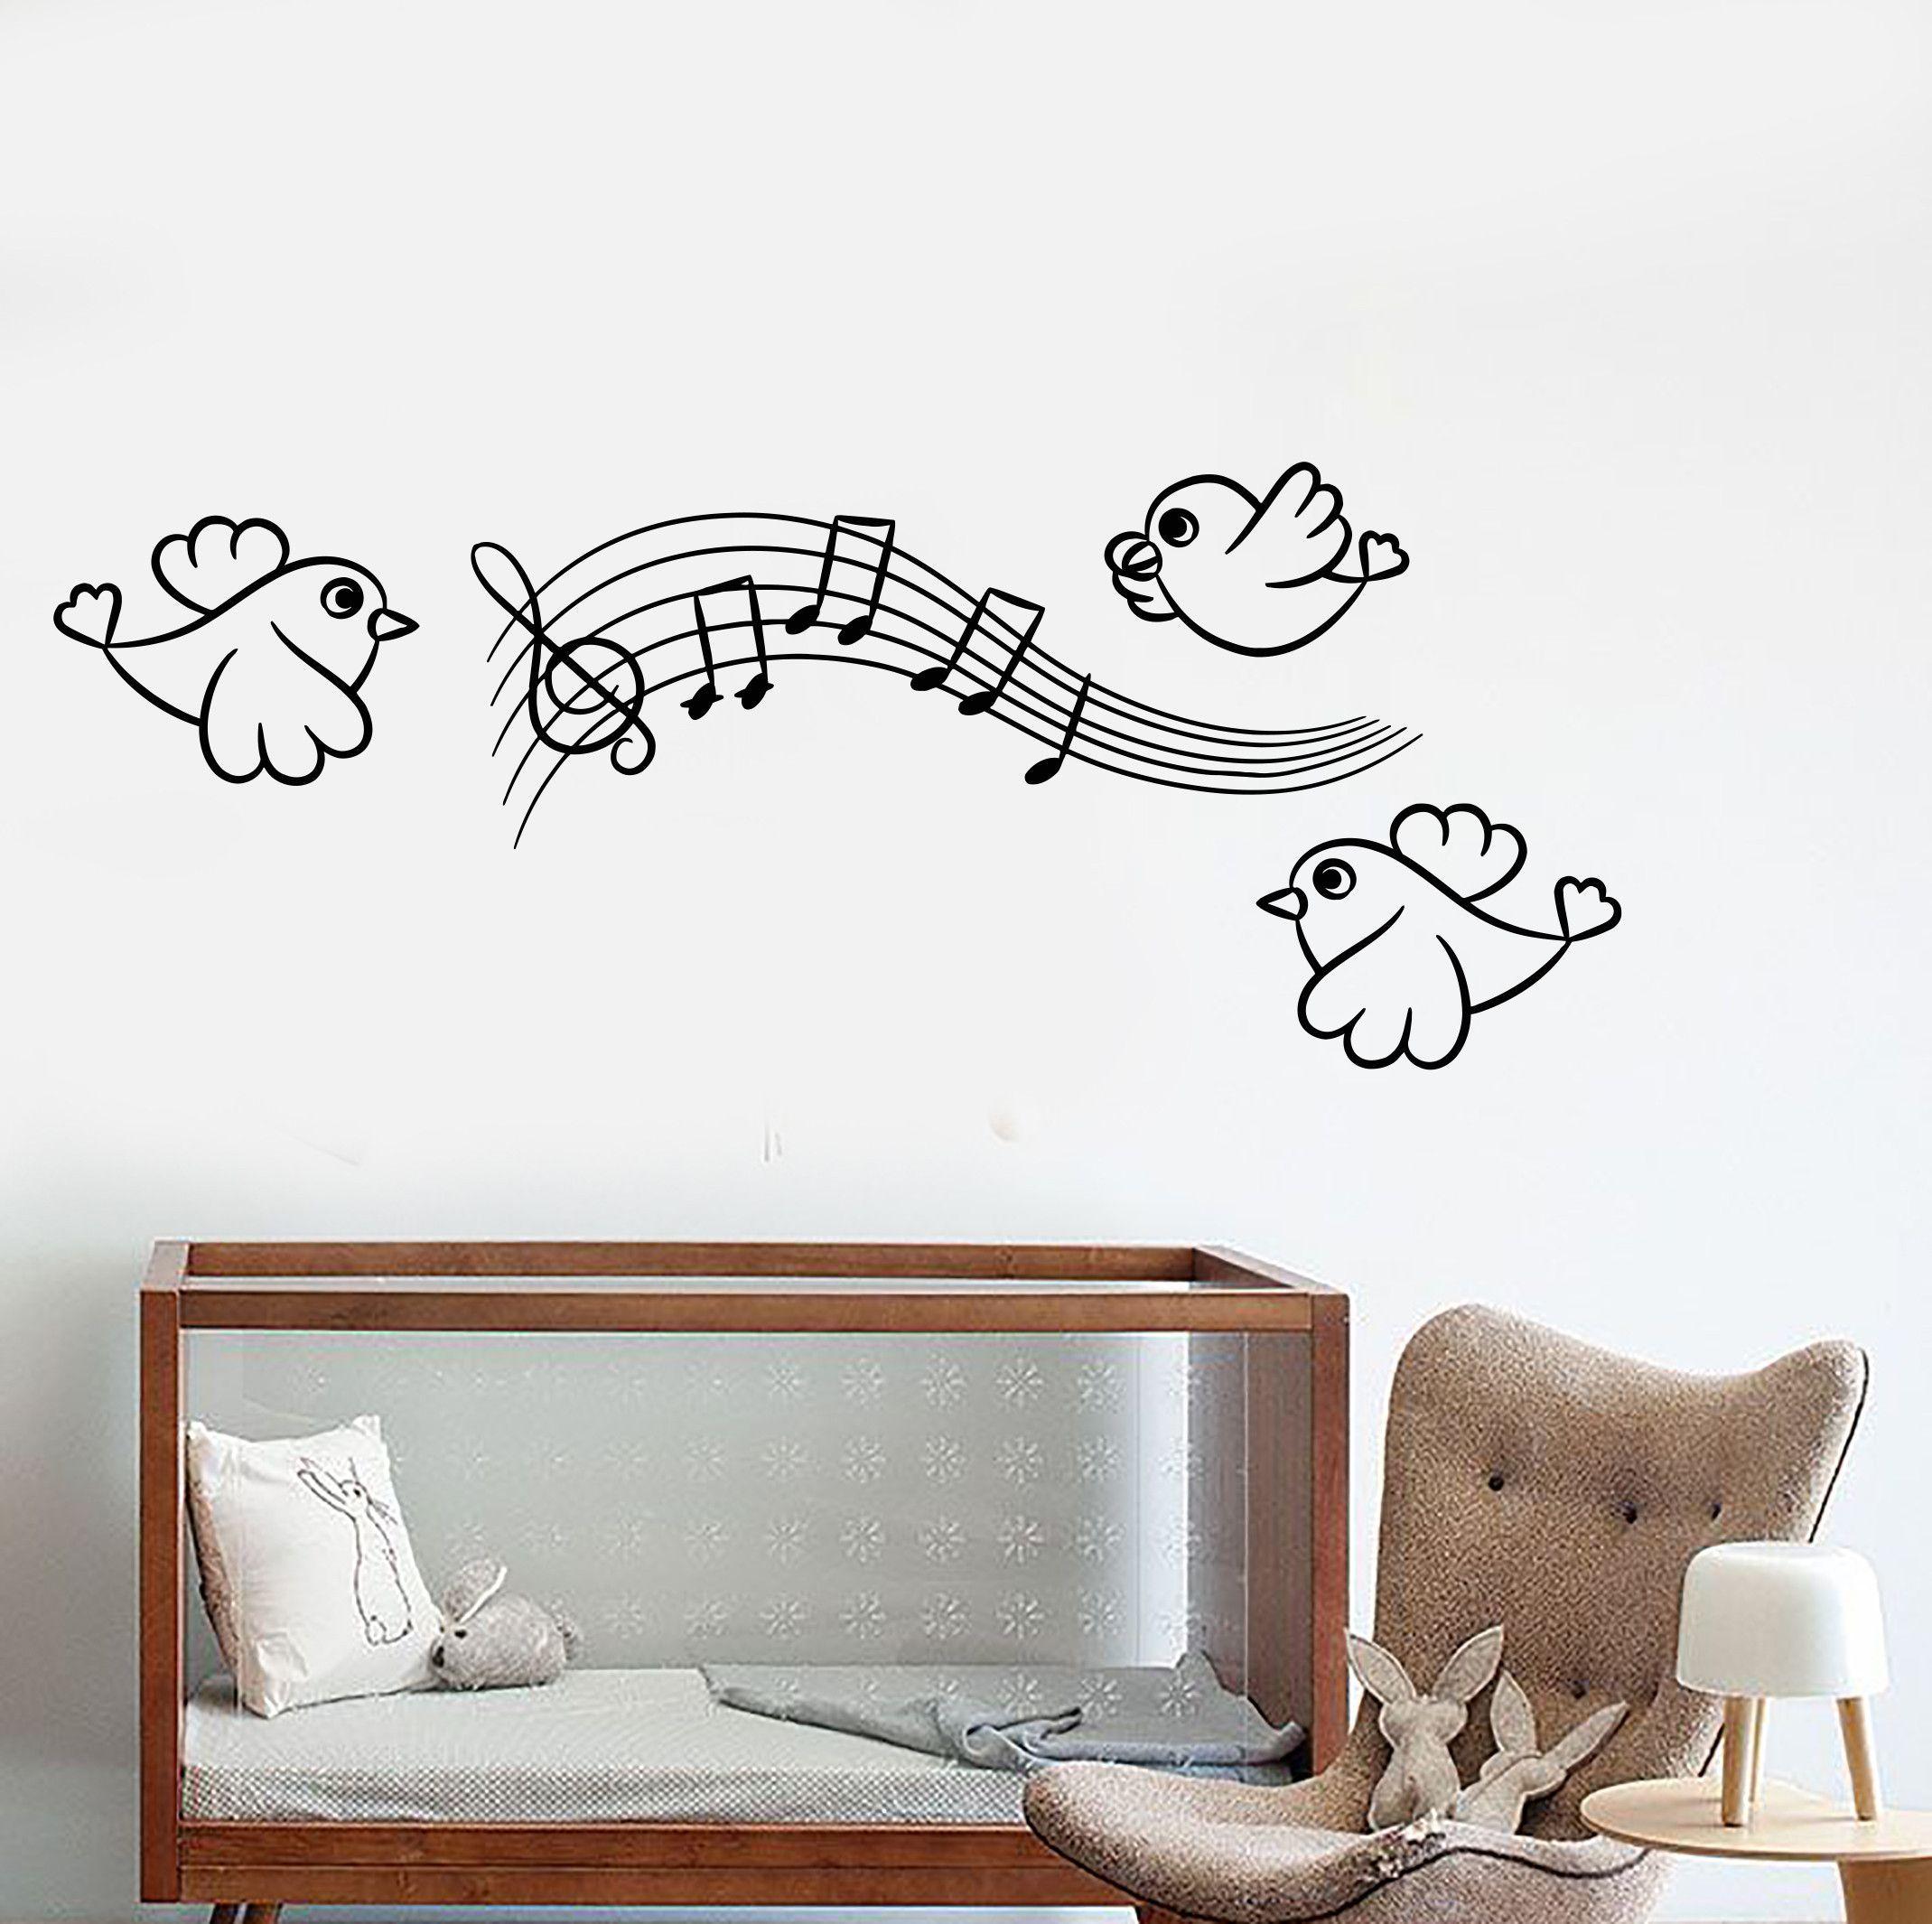 decor home of decorations blue design inspirational house music ideas